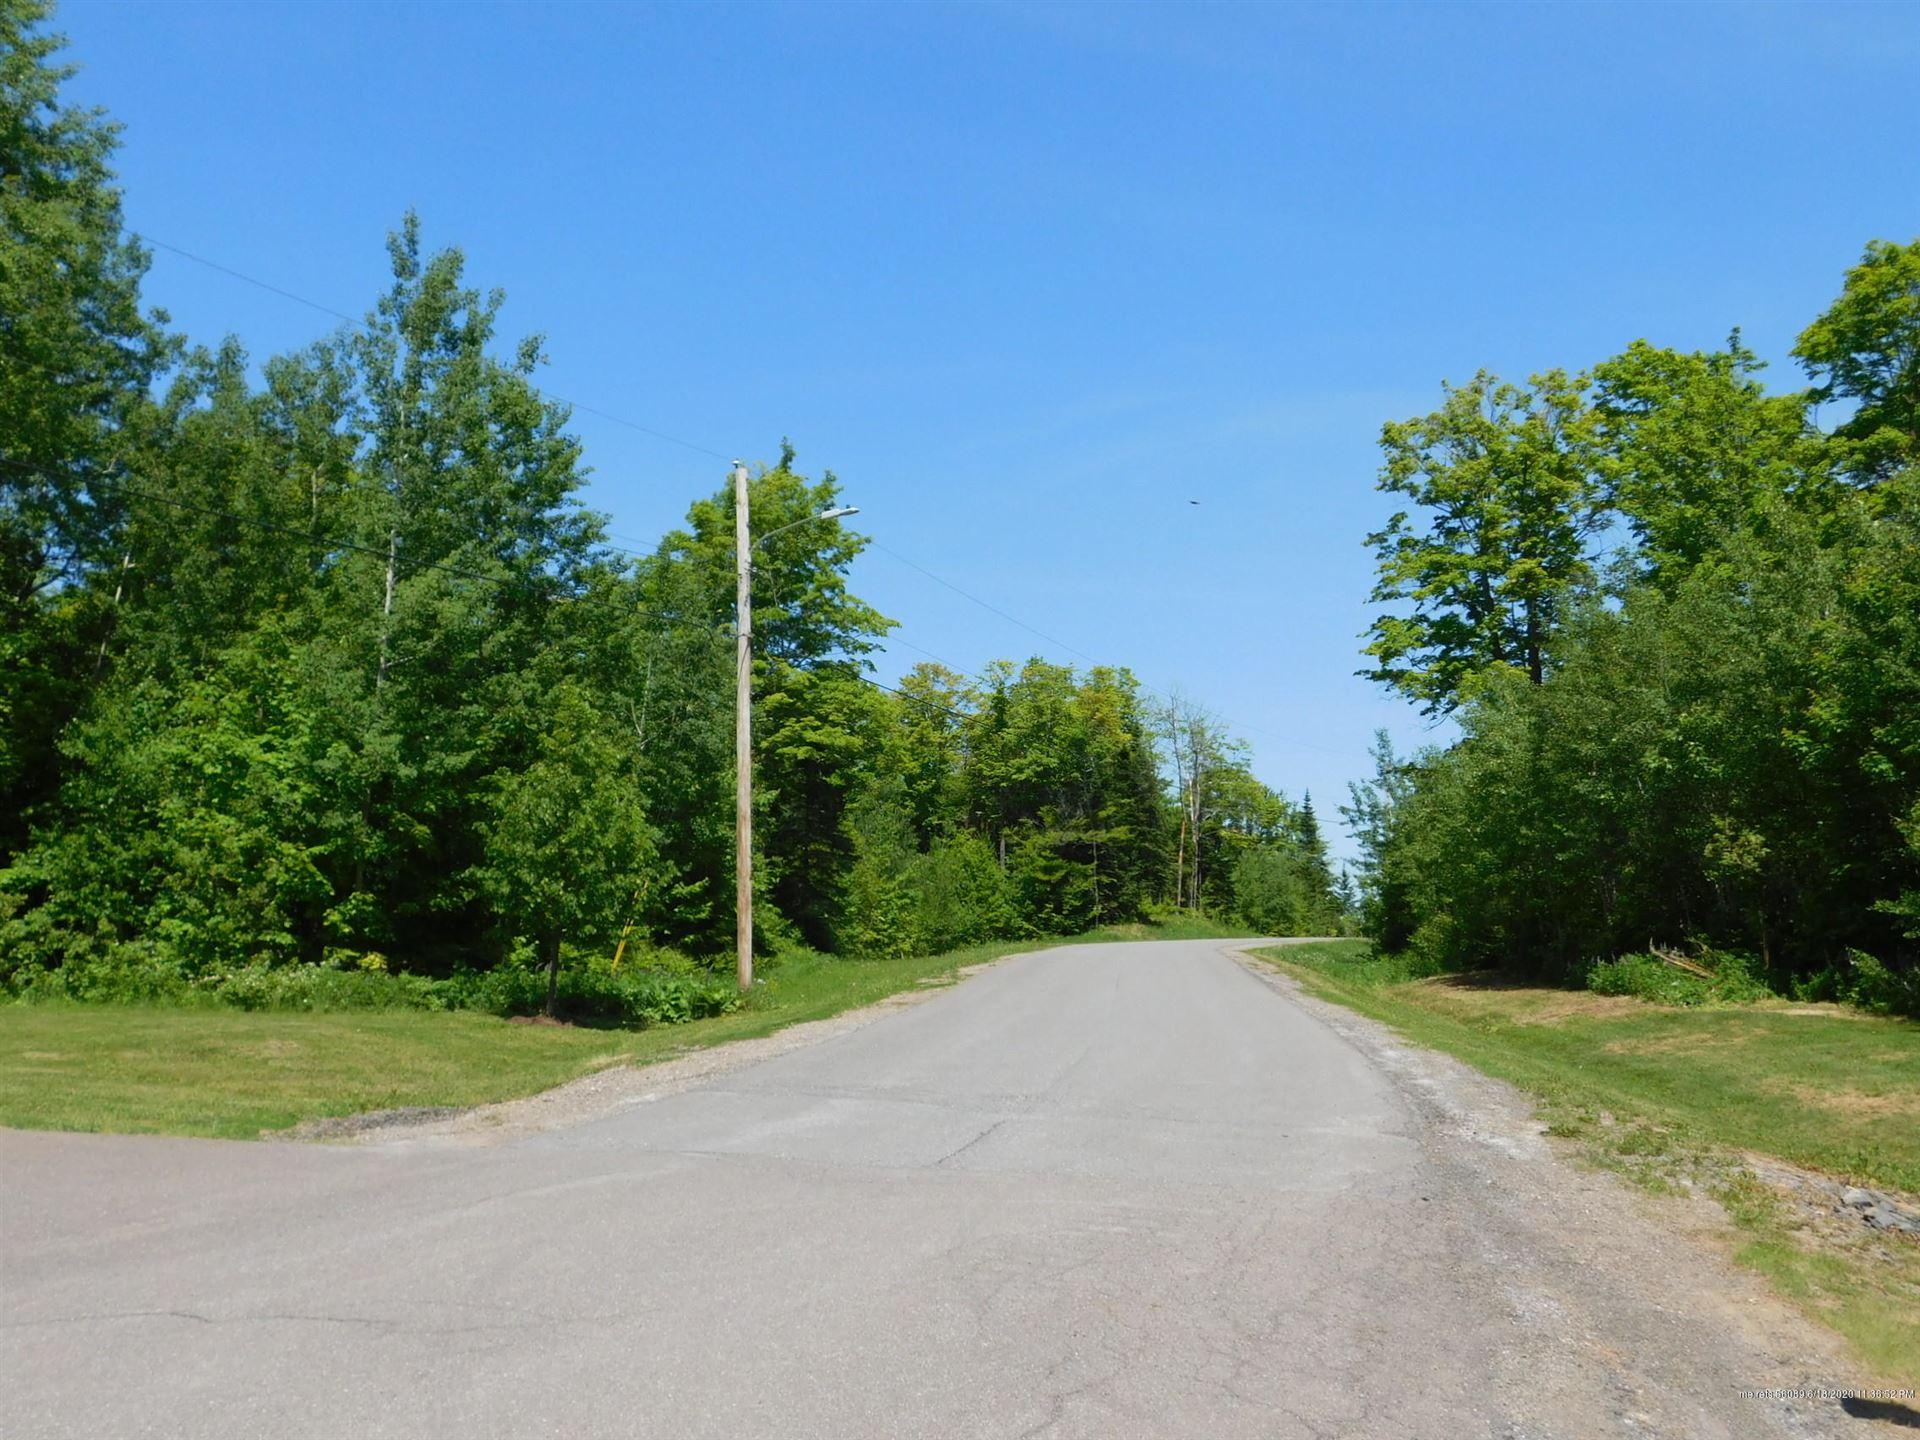 Photo of 2 Duncan Drive, Easton, ME 04740 (MLS # 1439391)